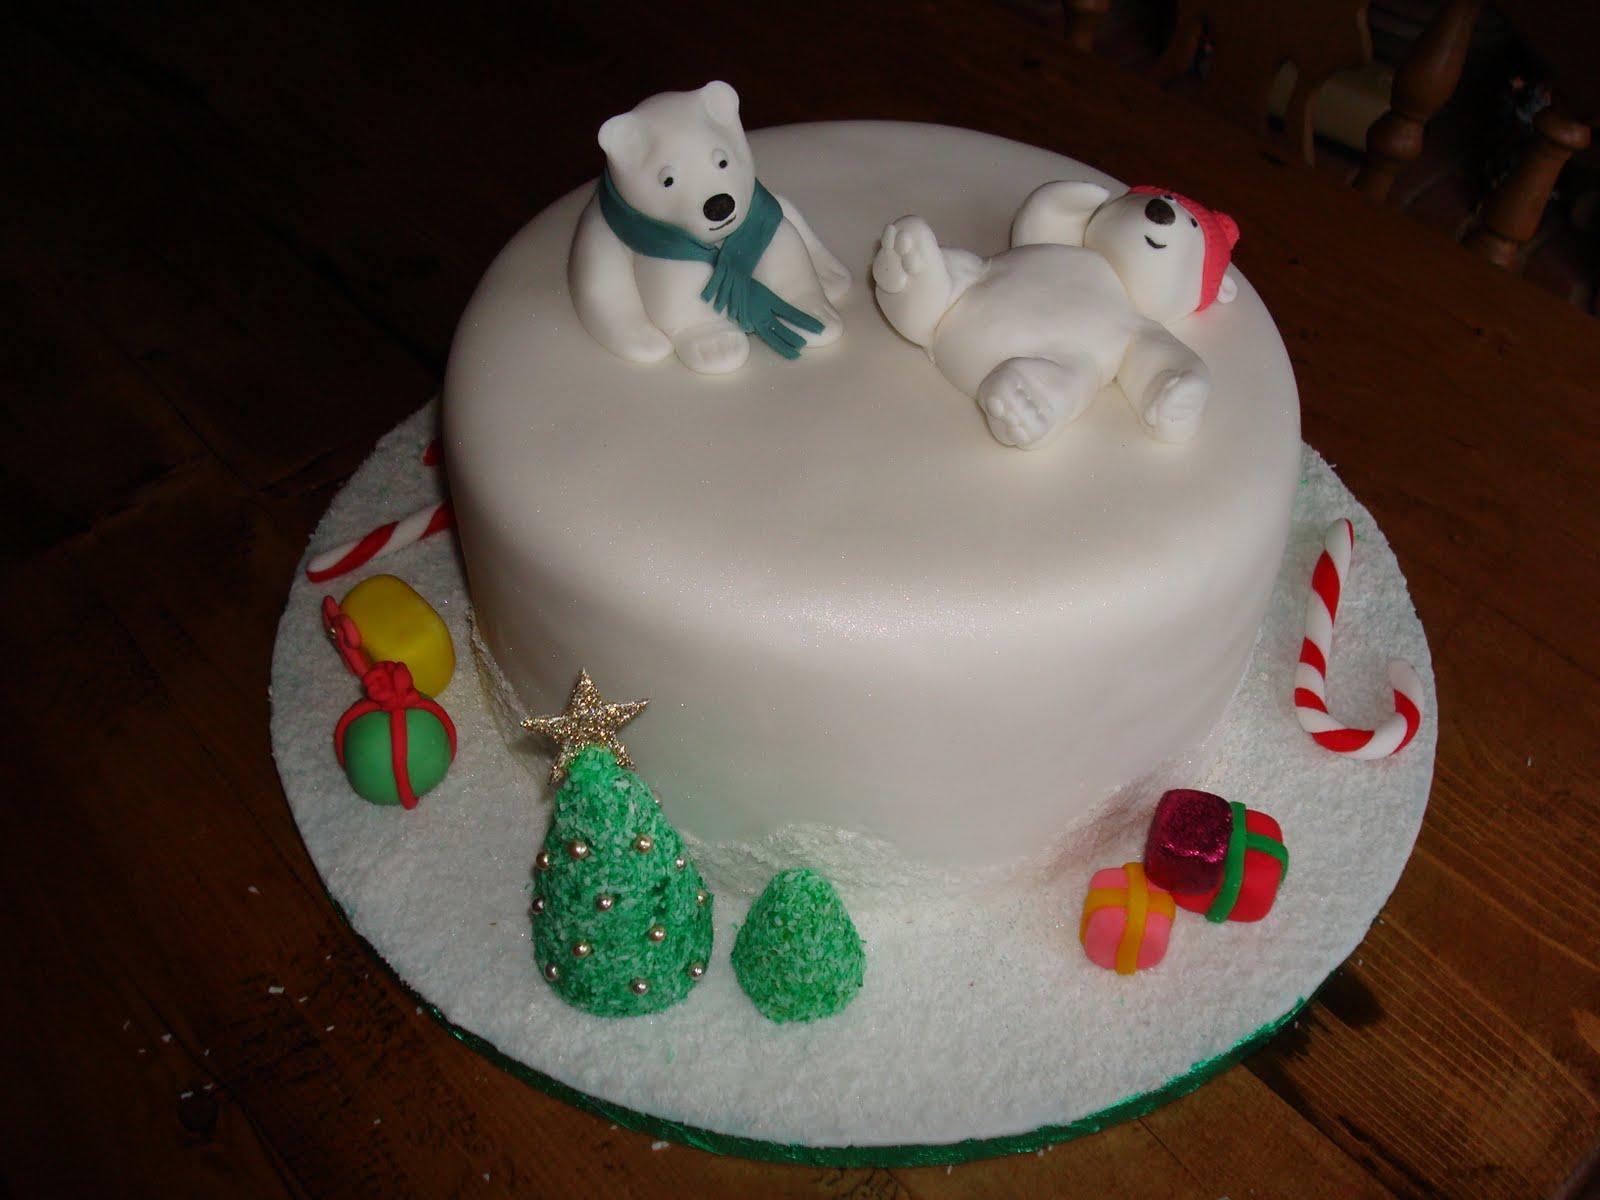 Fondant Cake Designs For Christmas : Fondant Cakes & Cupcakes: Beary Christmas